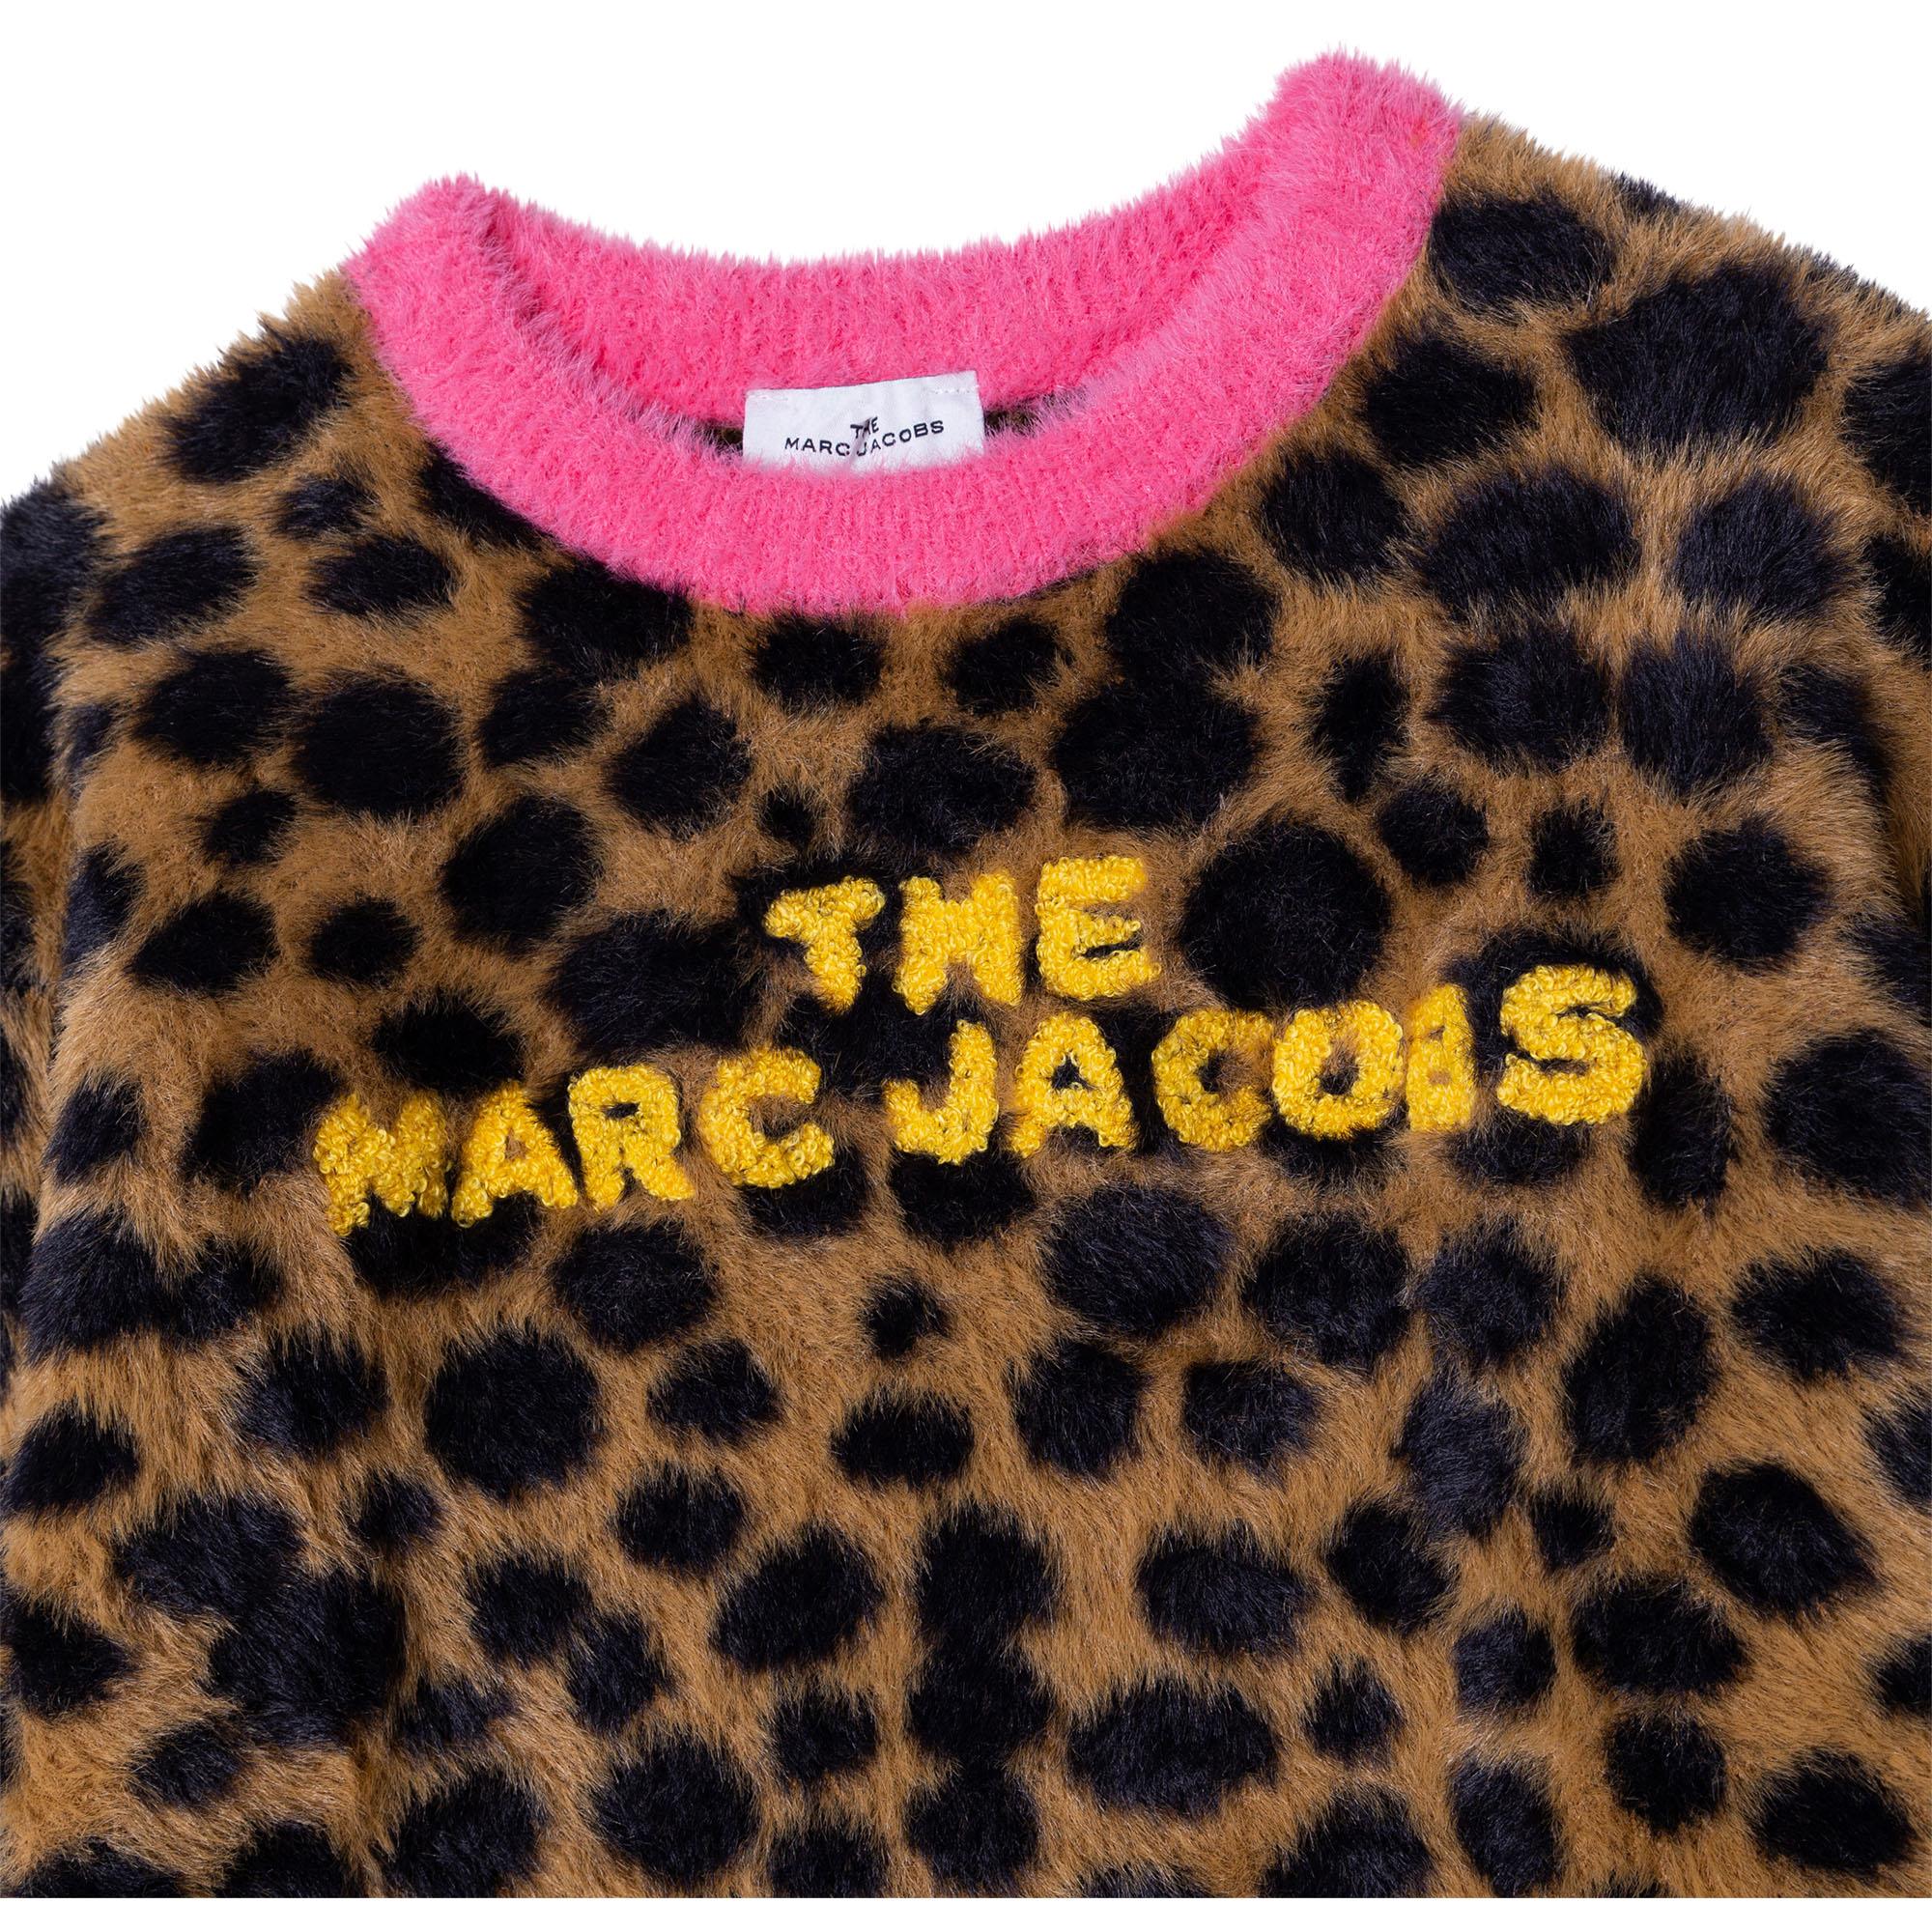 KNITTING DRESS THE MARC JACOBS for GIRL